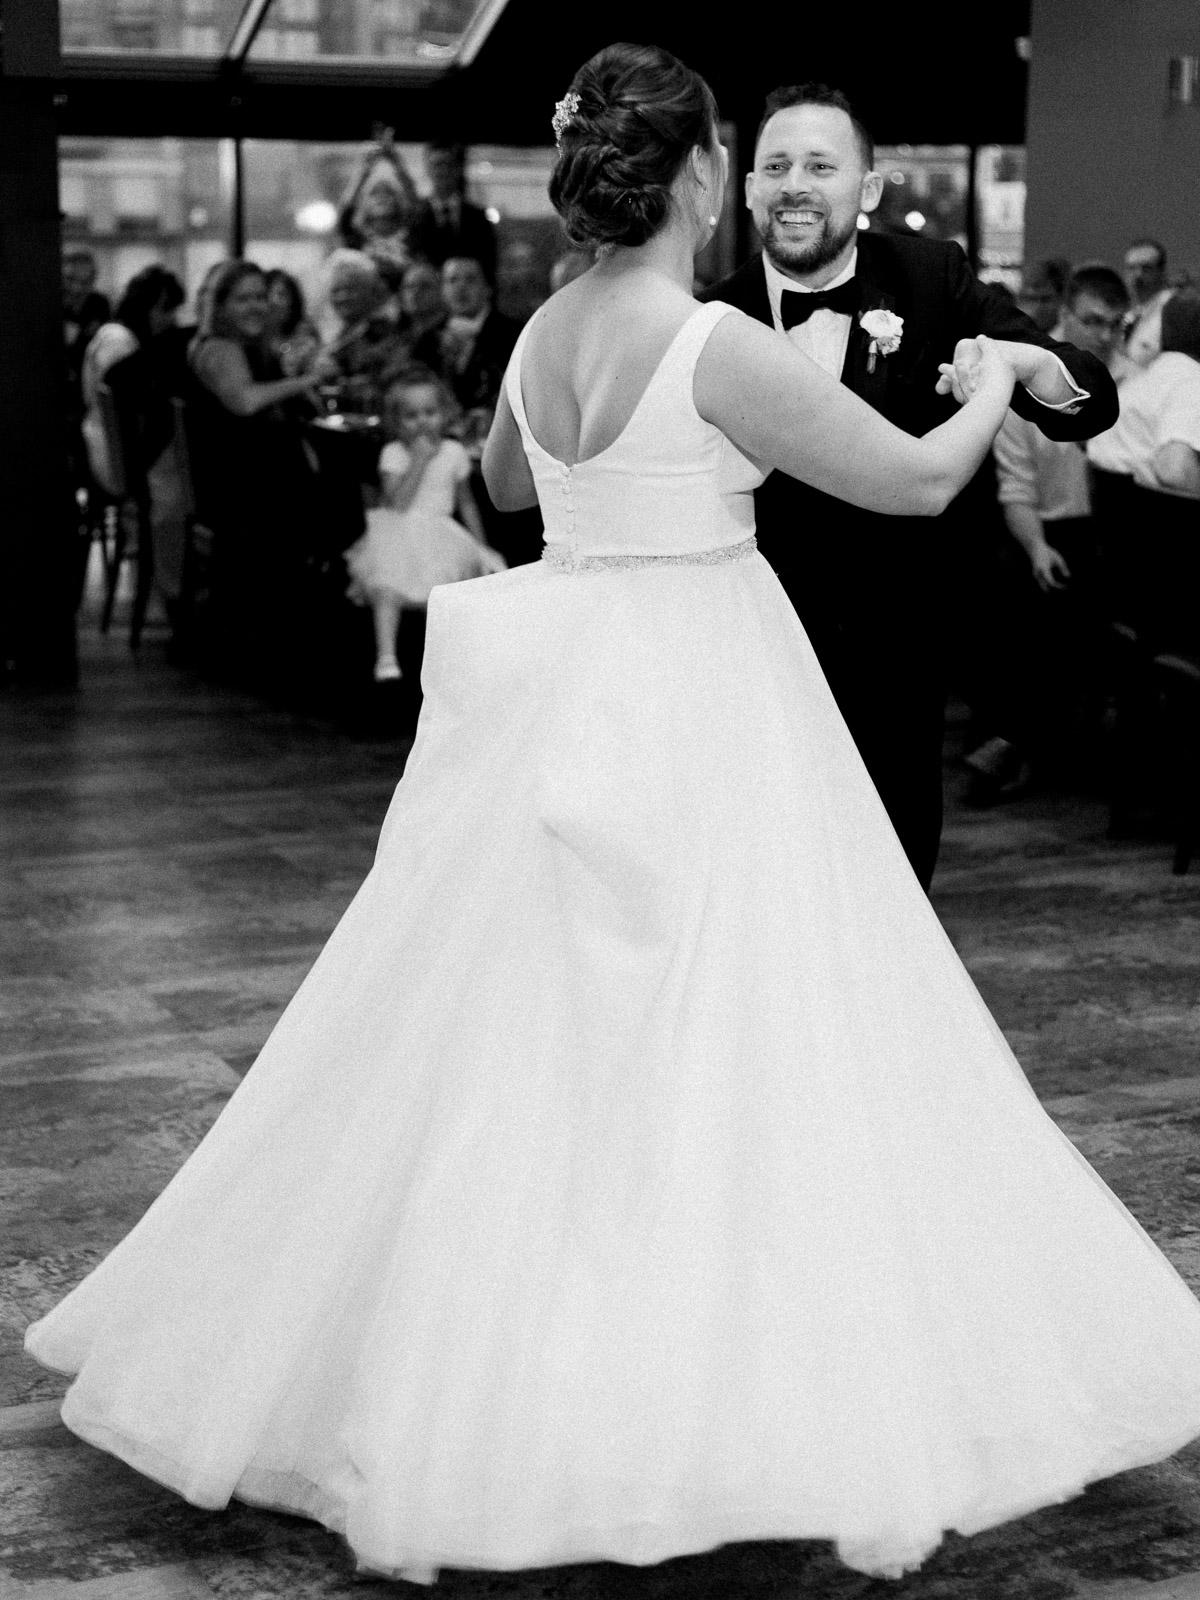 Bright and Joyful Cleveland Wedding Photography at Music Box Supper Club-42.jpg